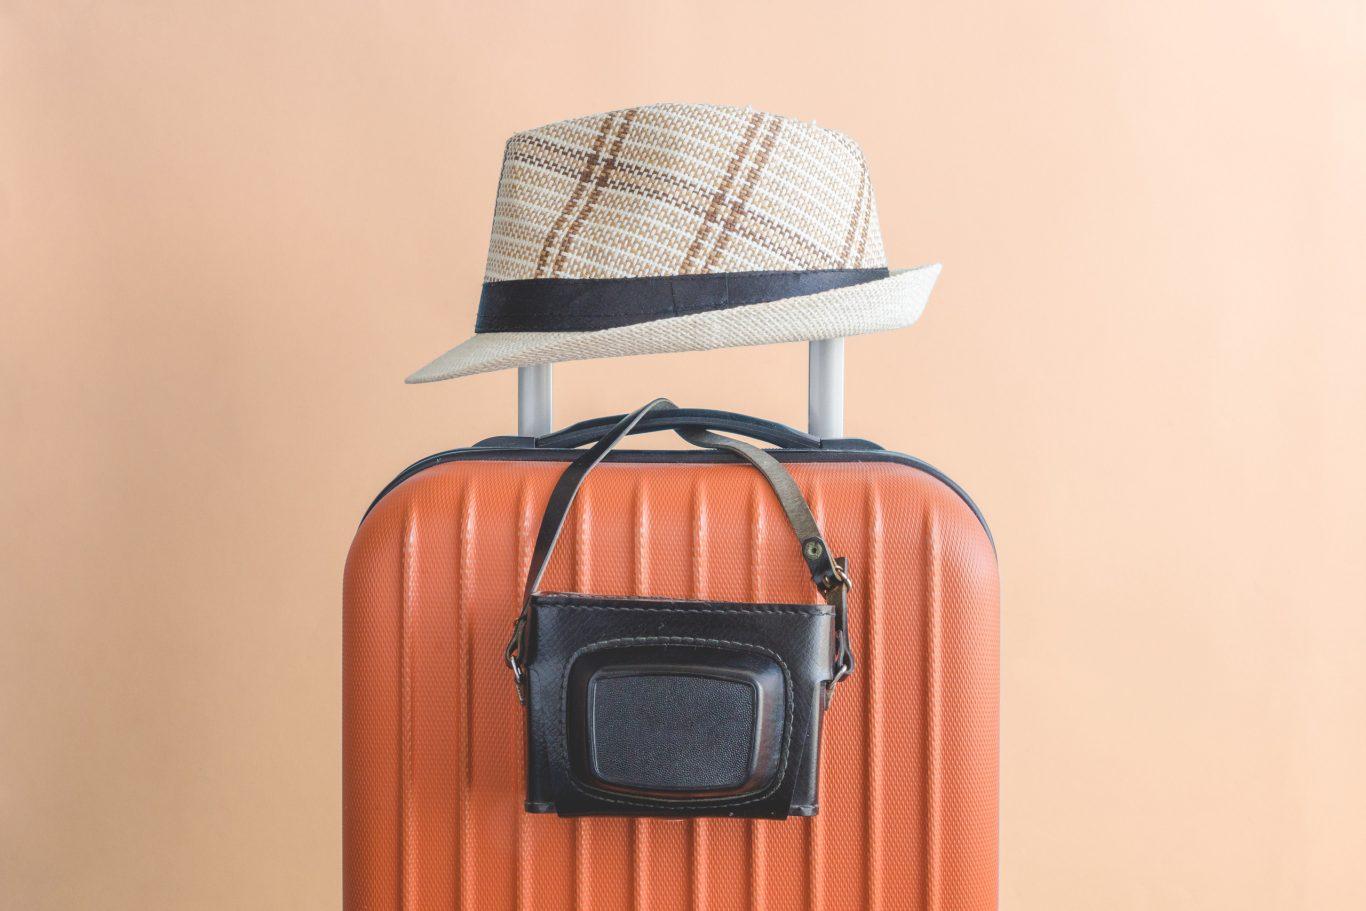 maletas inteligentes